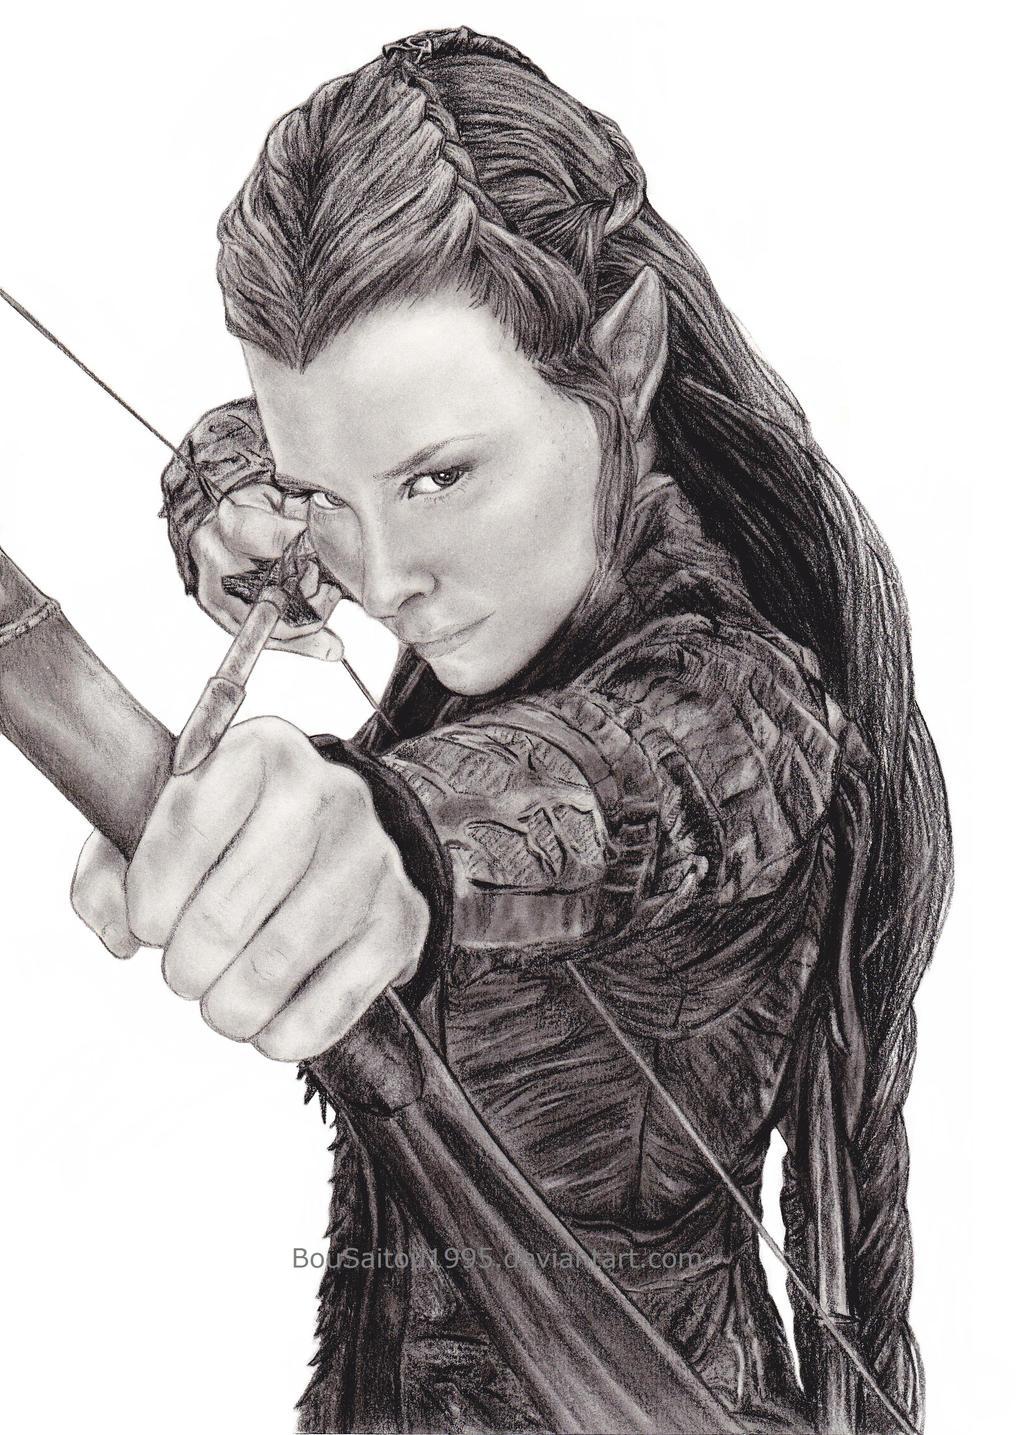 [The Hobbit] Tauriel